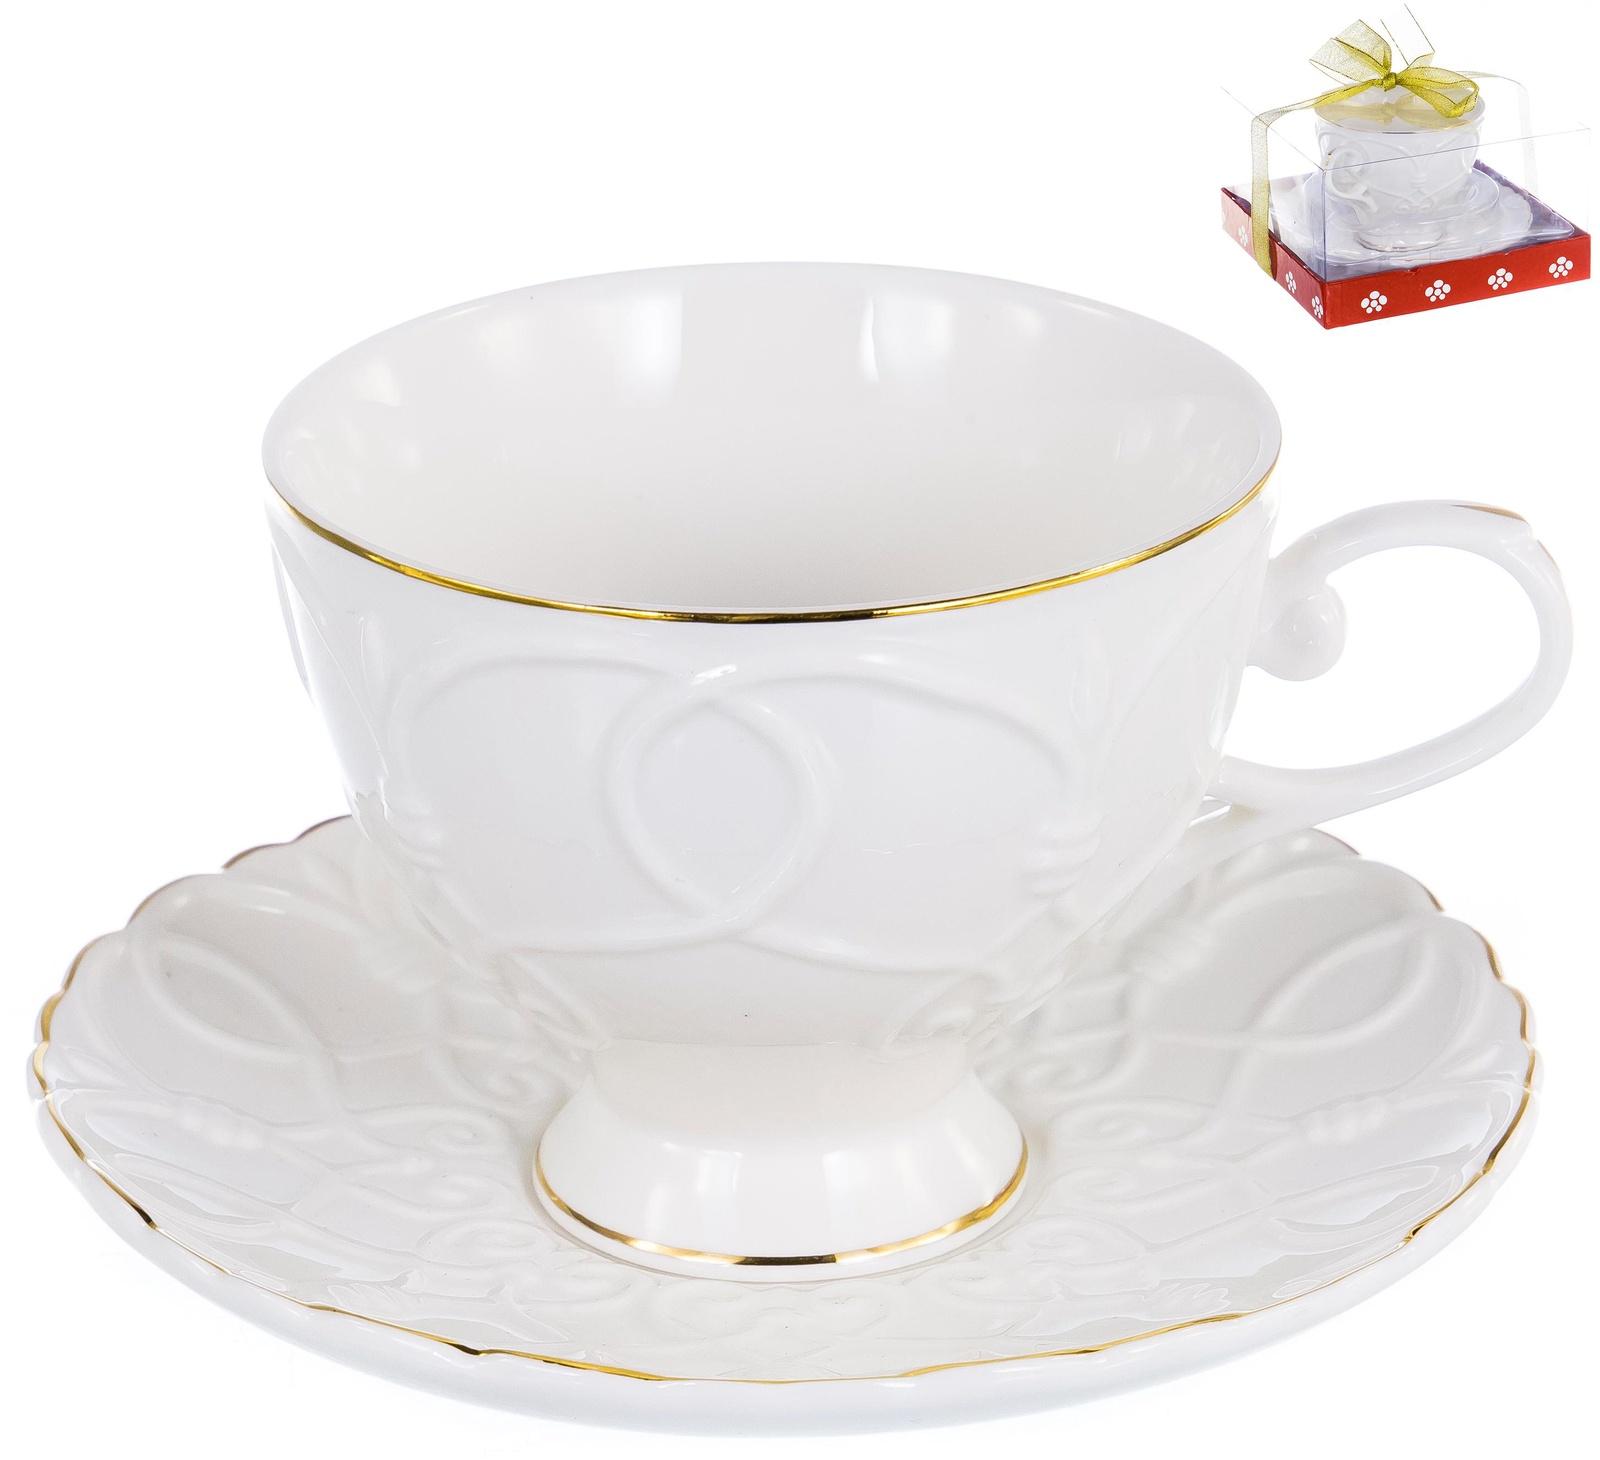 Набор чайный ГРАЦИЯ серия КЛИО, ТМ Balsford, артикул 101-30044